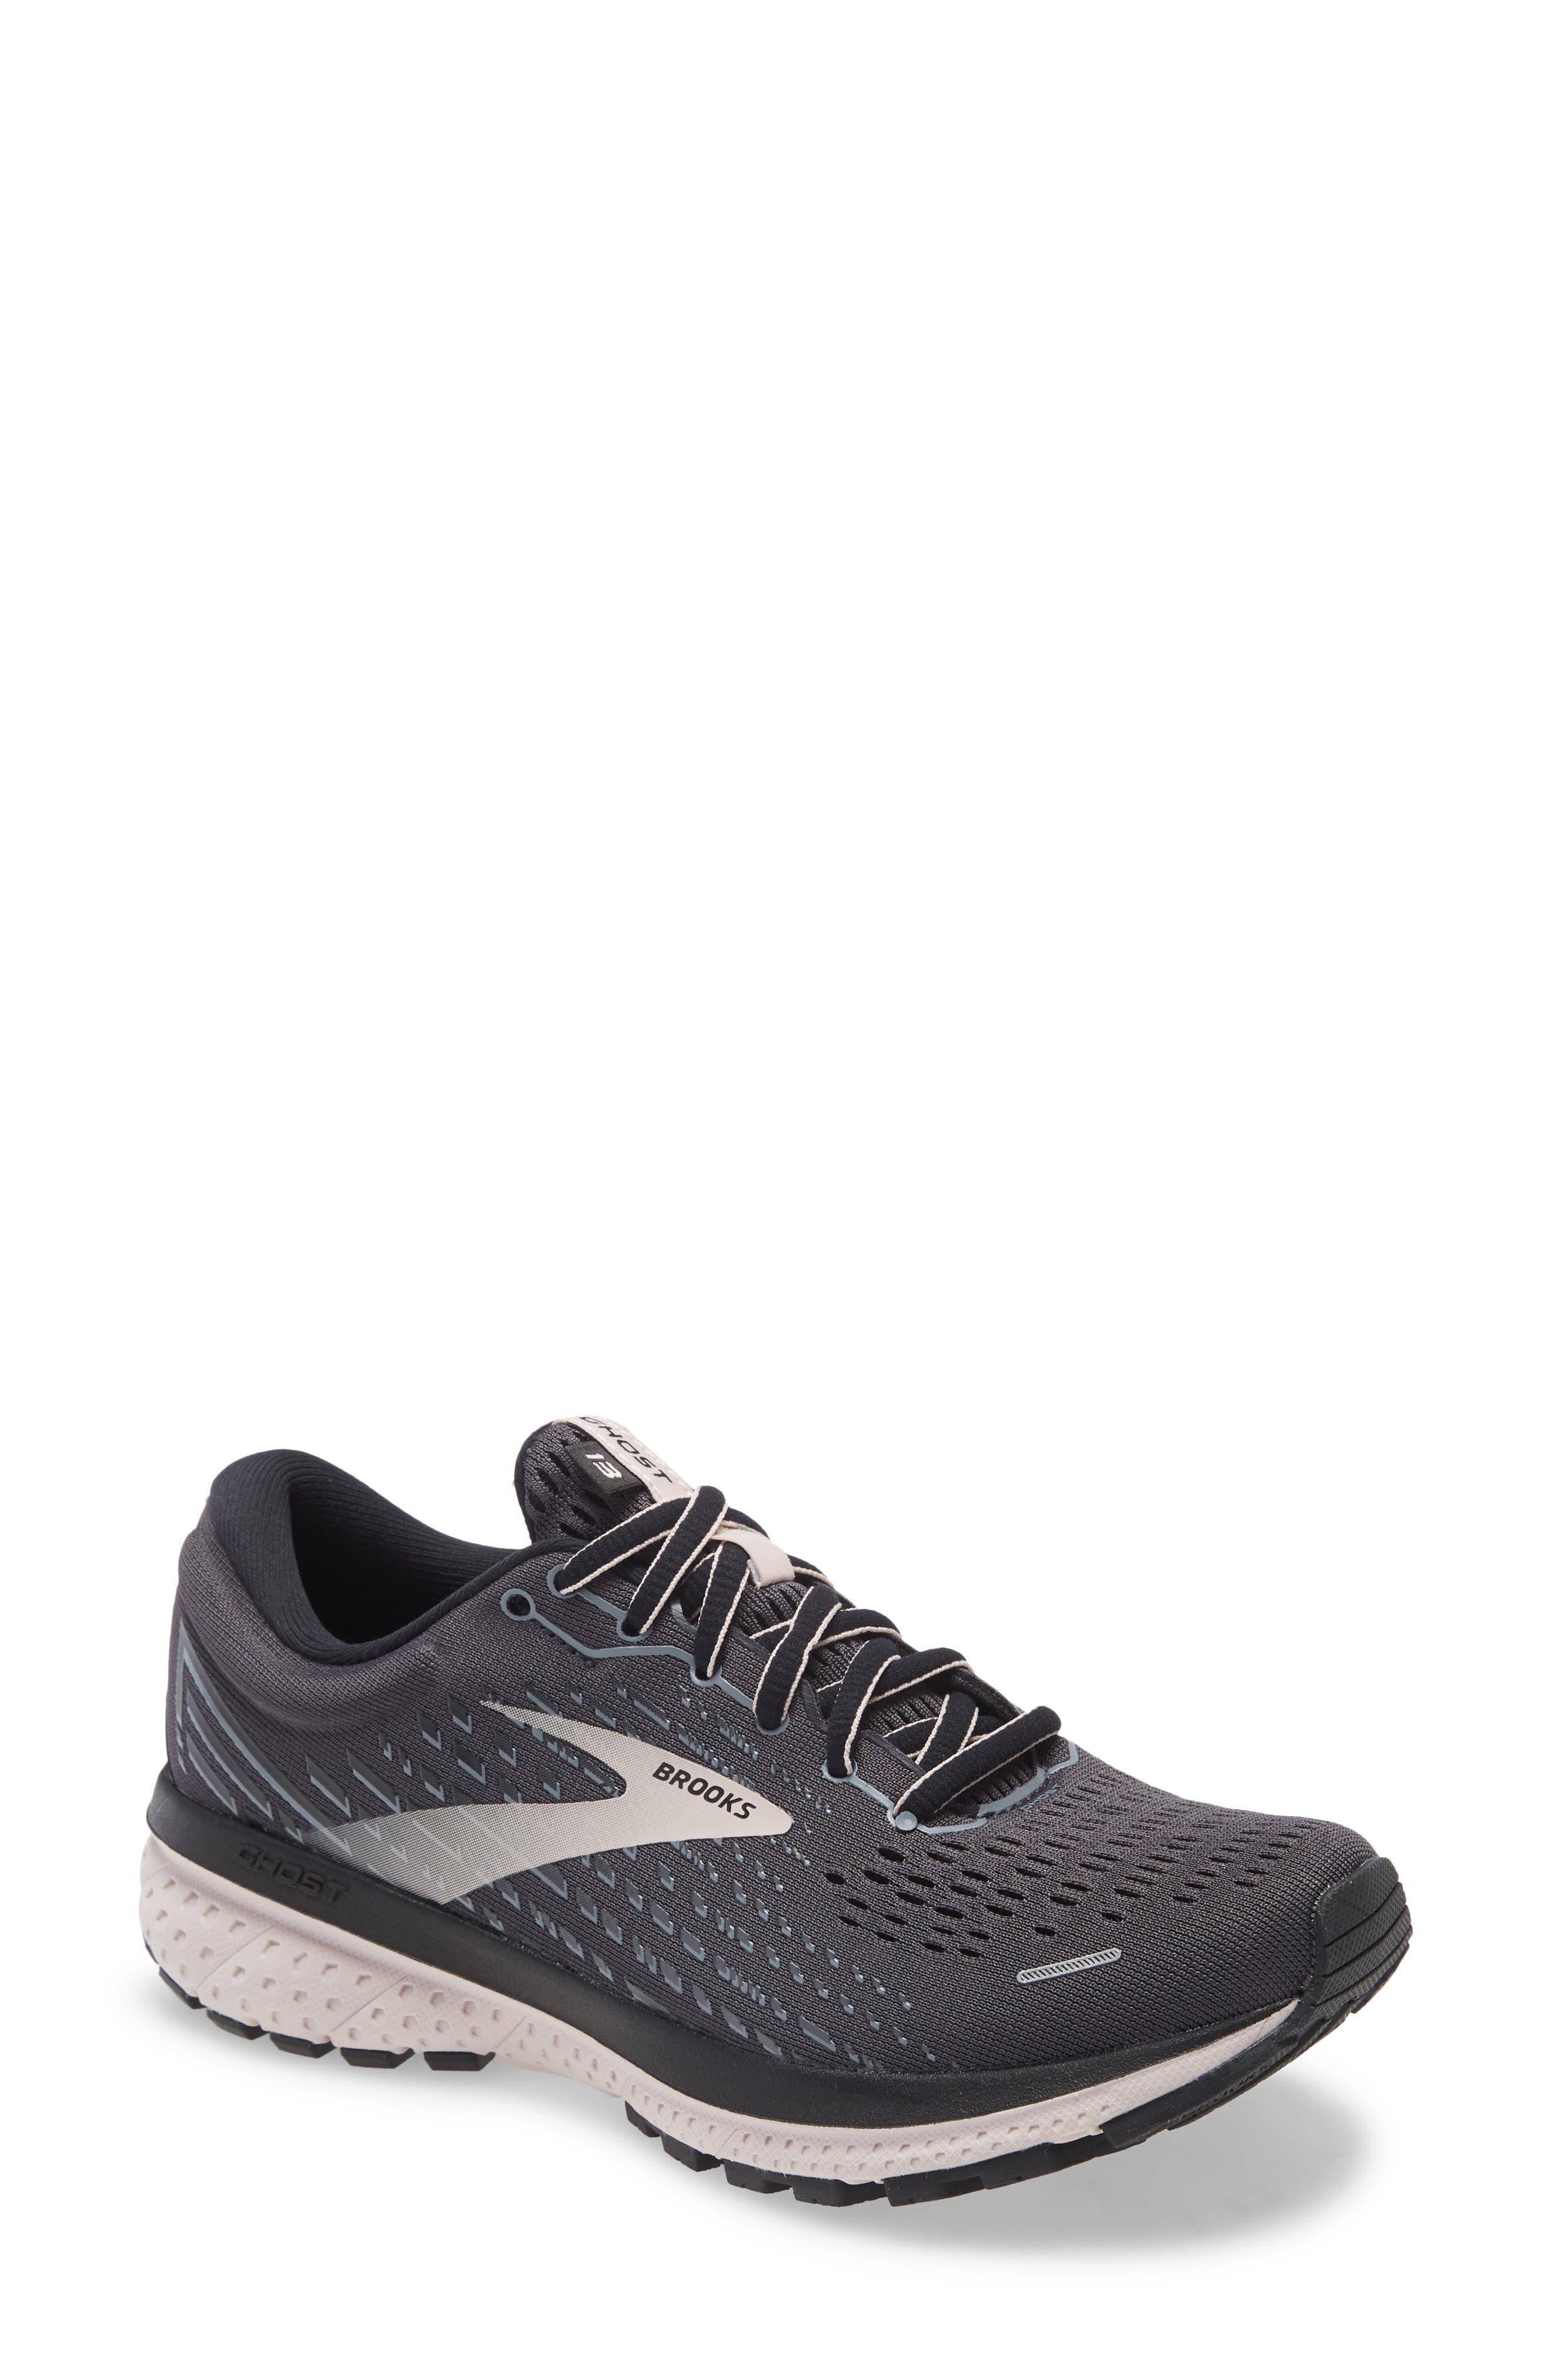 Ghost 13 Running Shoe